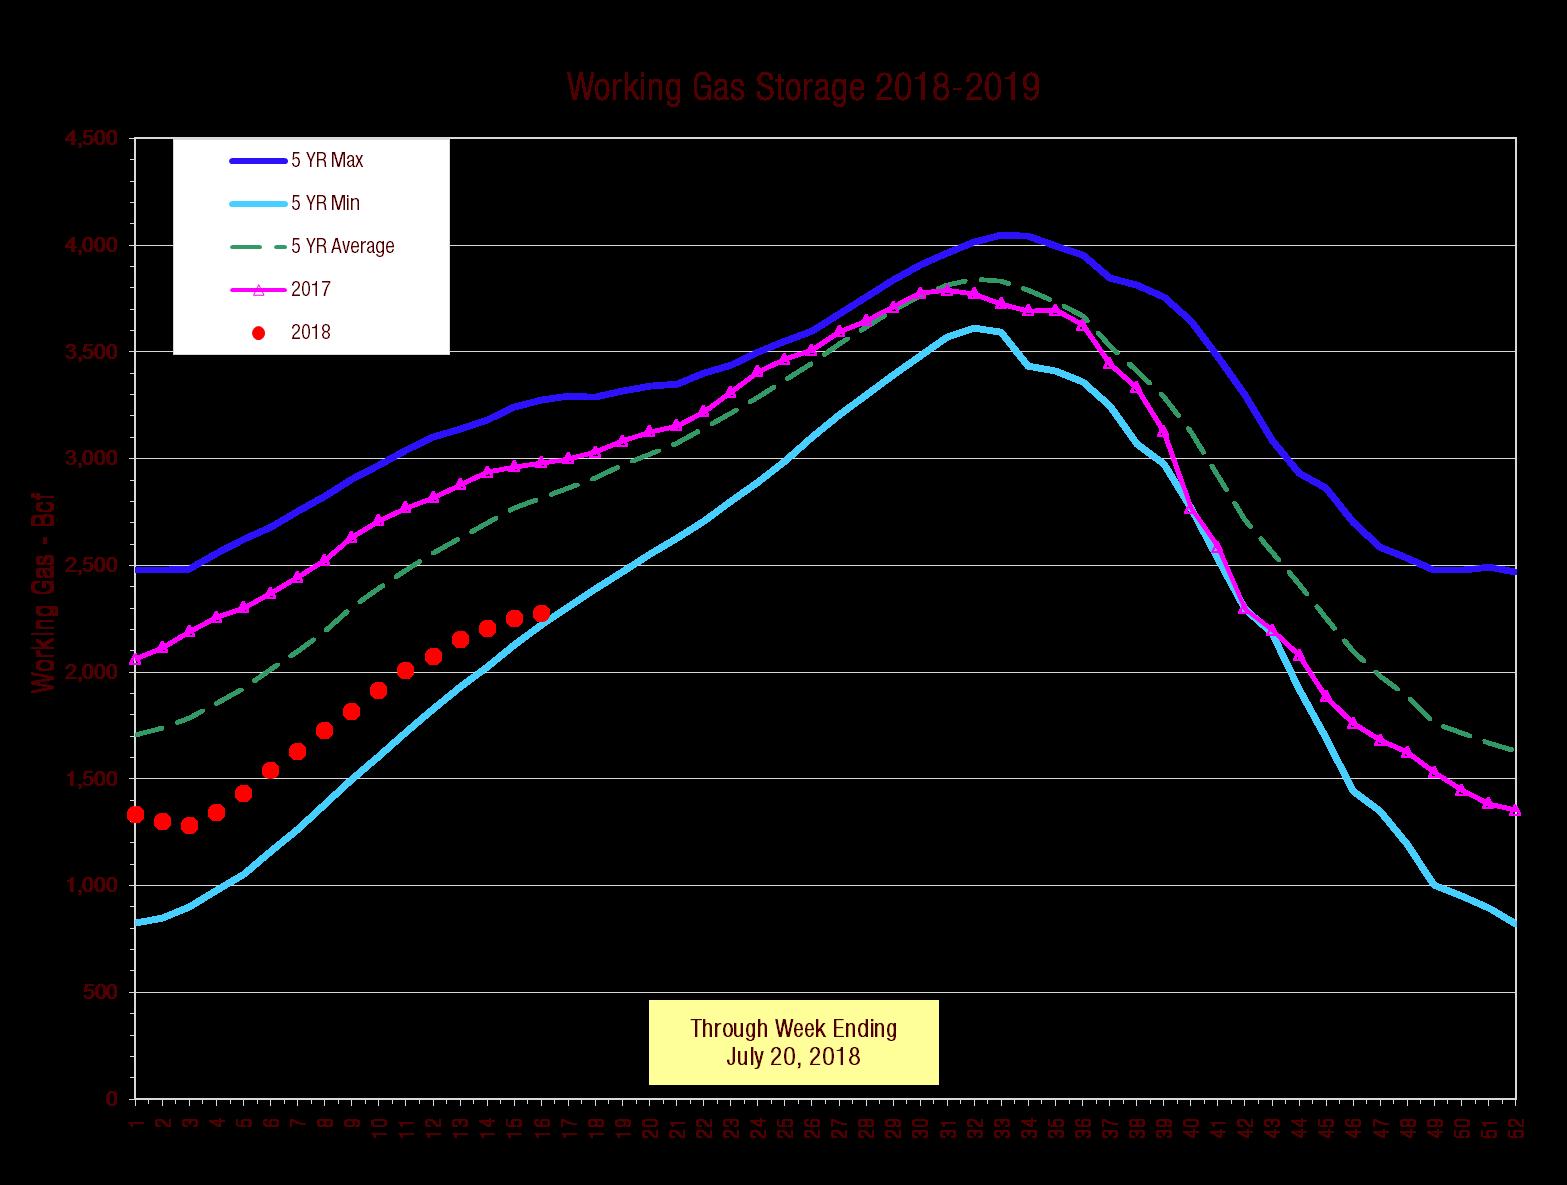 Working Gas Storage Plot.png